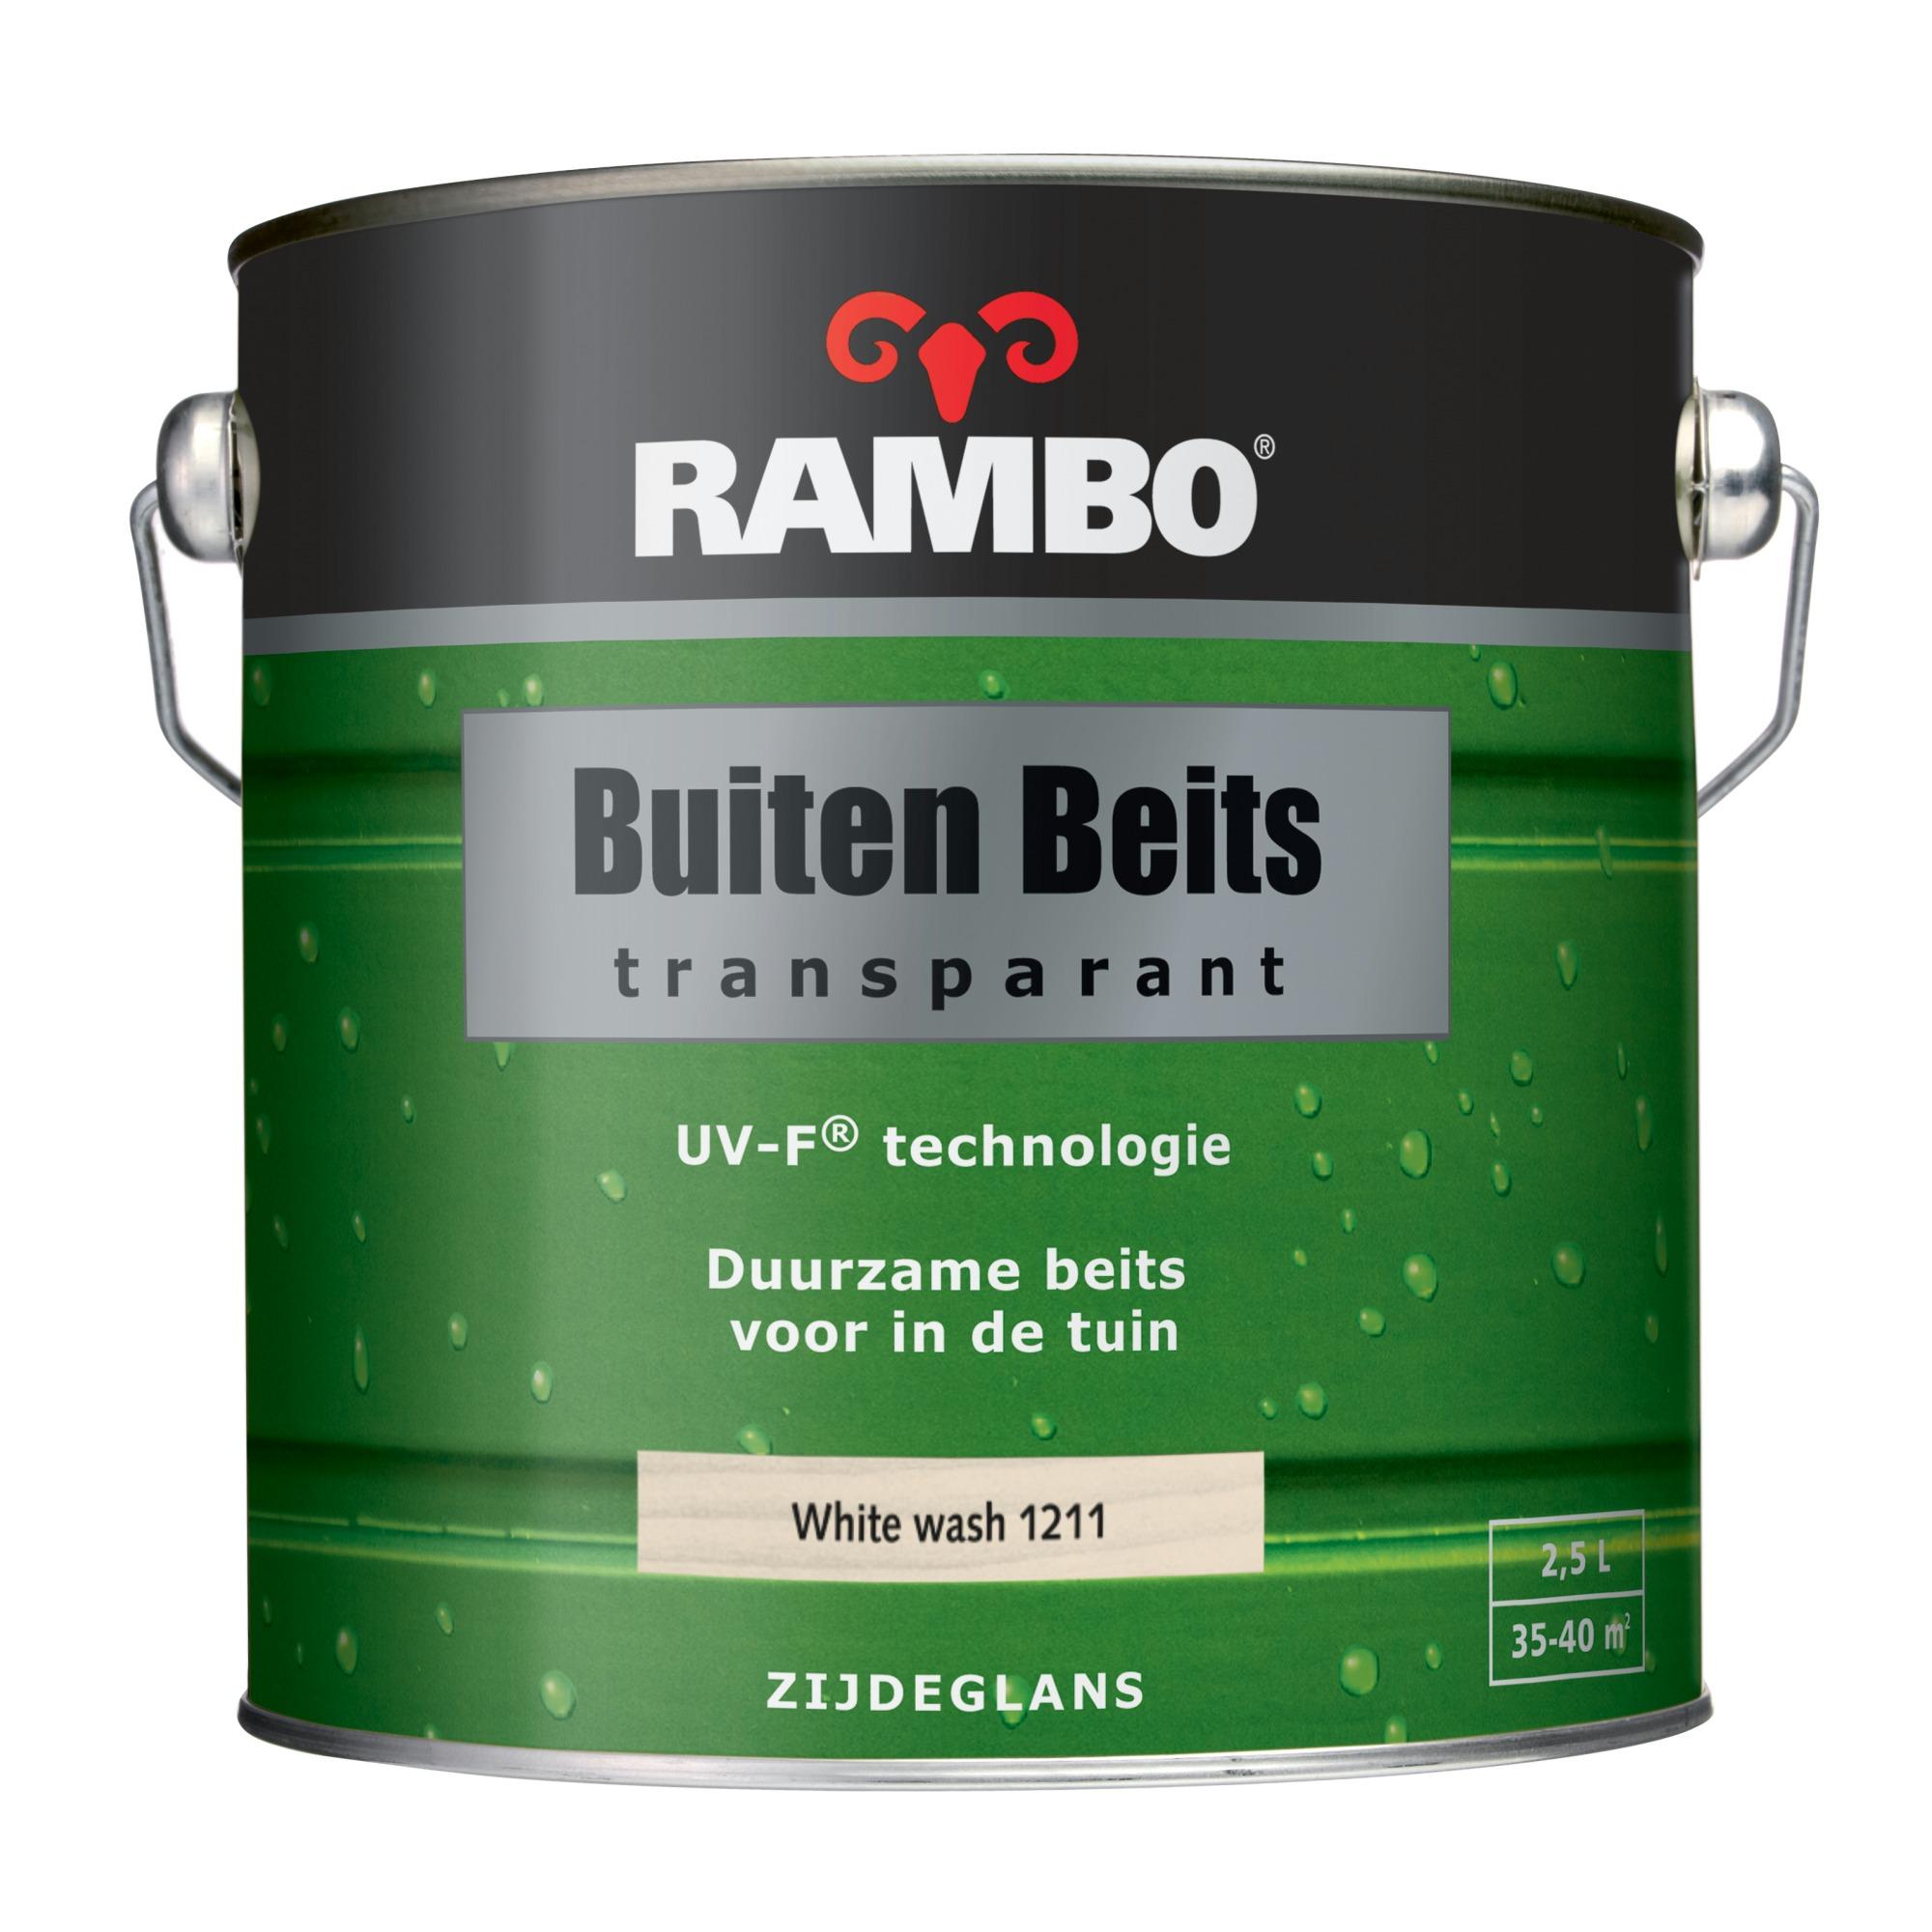 Rambo buitenbeits white wash transparant 2,5 l